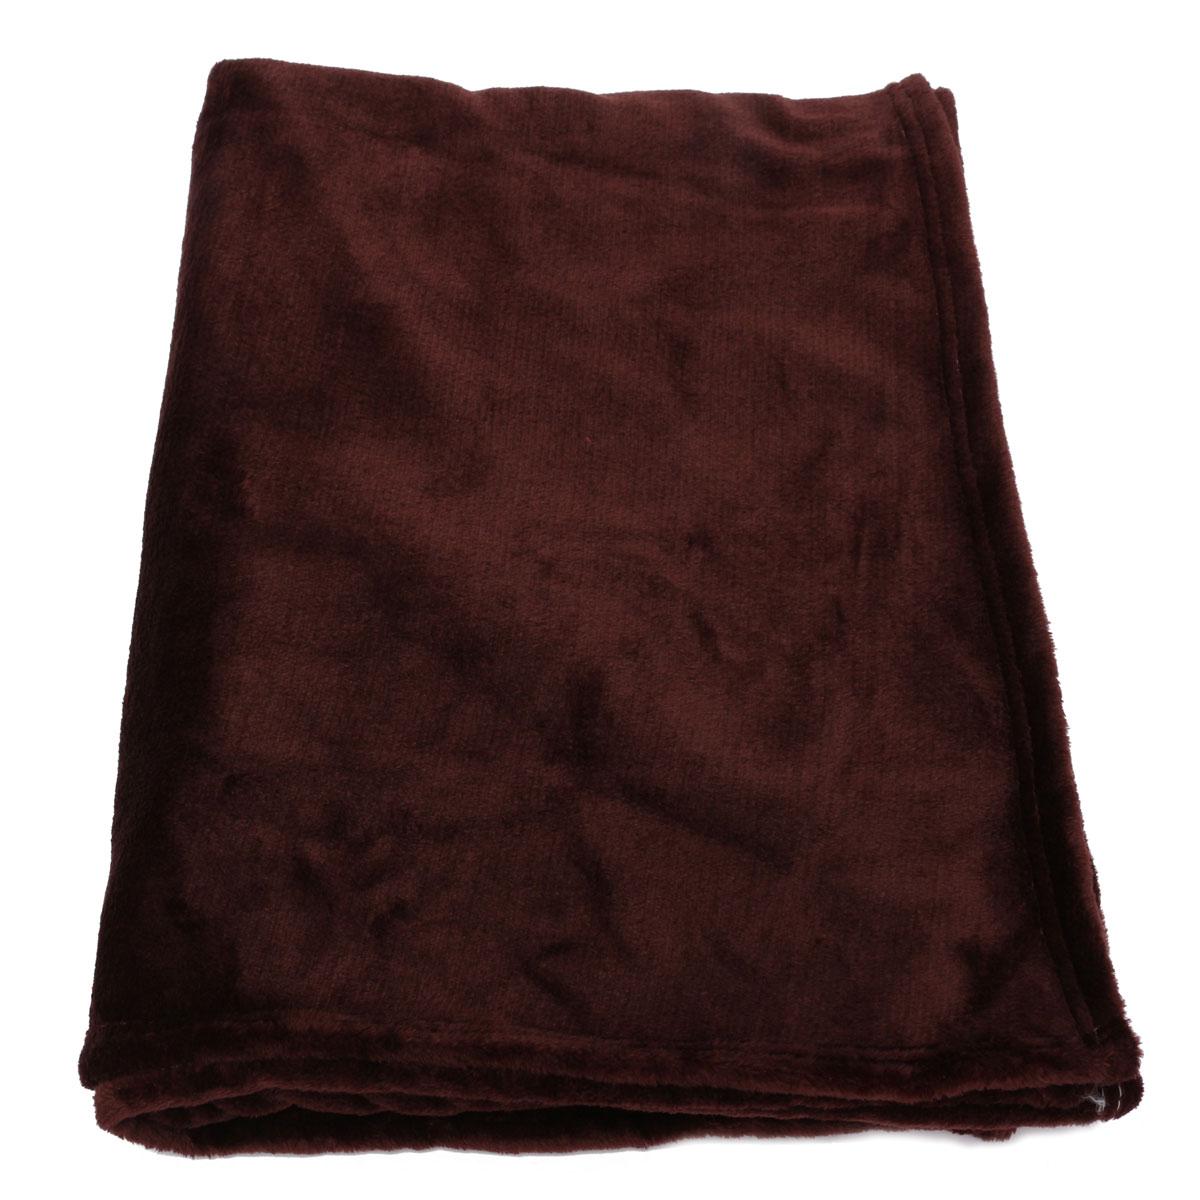 Plush Throw Rug: Super Soft Solid Warm Microplush Plush Fleece Blanket Rug